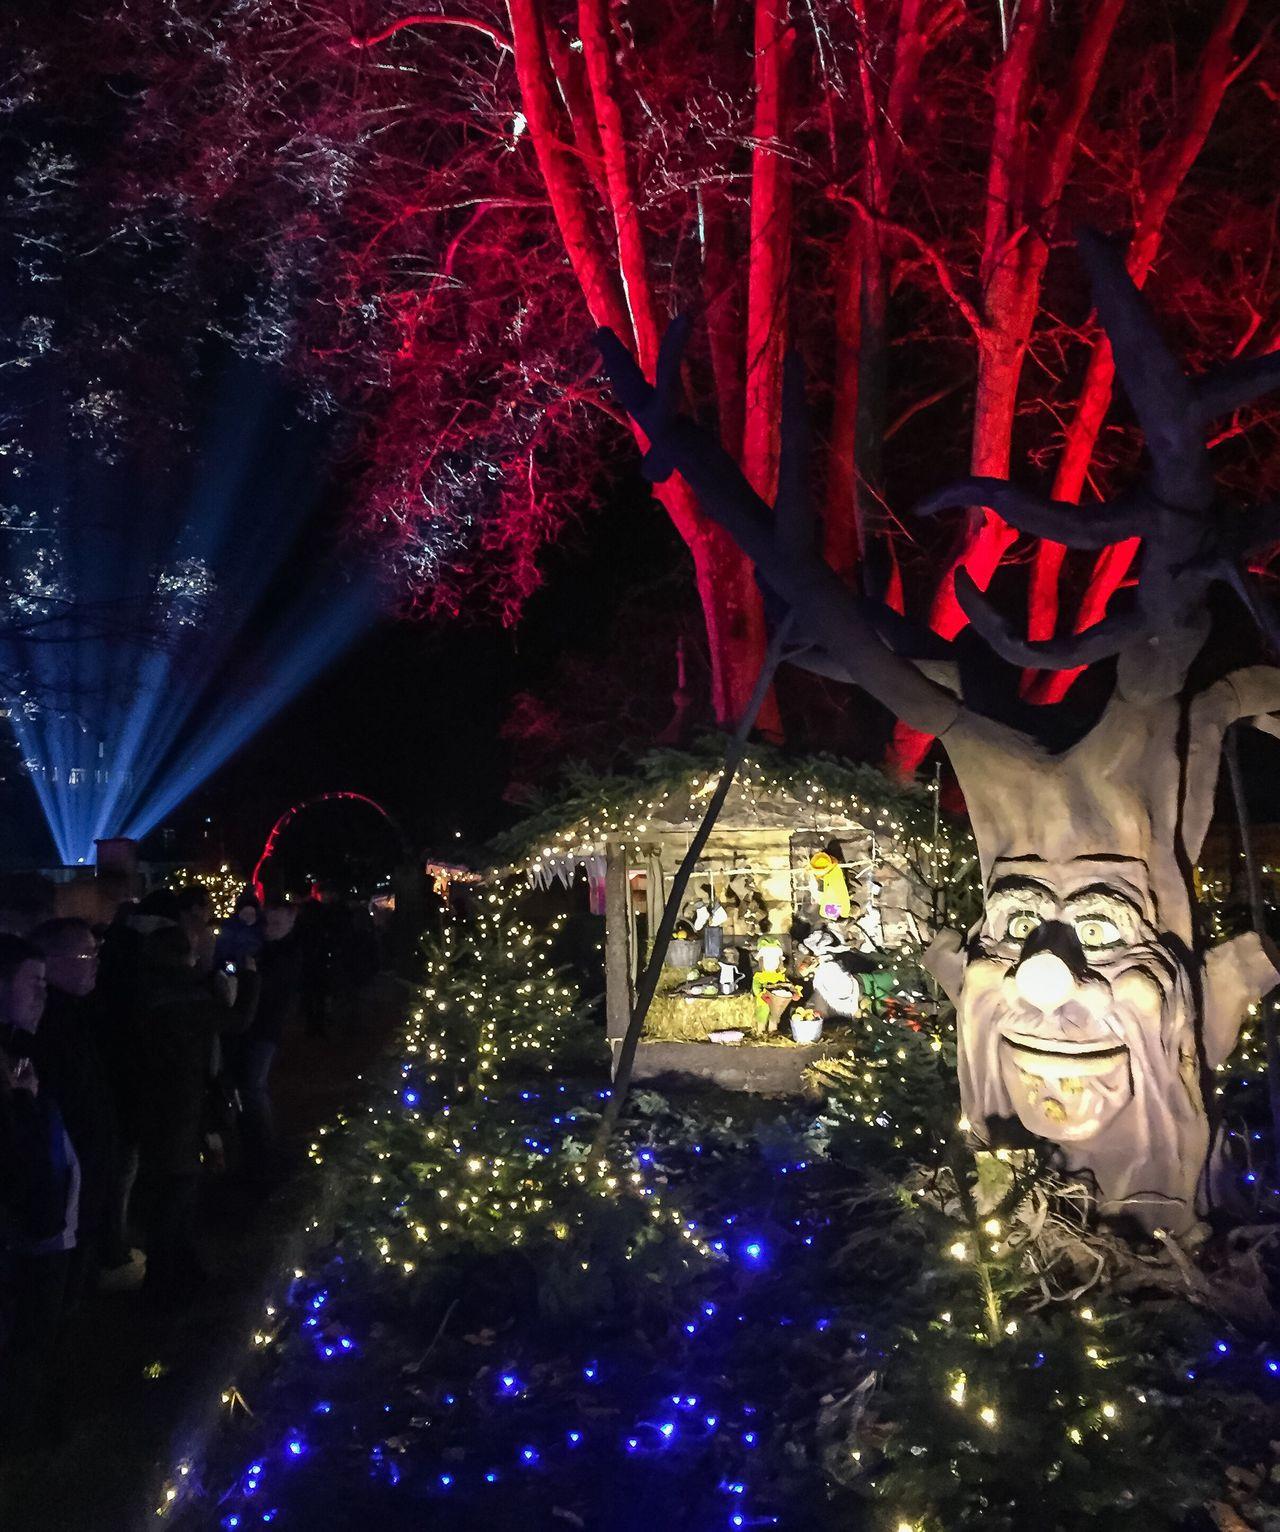 Fairytale Christmas mood 🎄🎅✨ Fairytale  Christmas Mood Lights Nightshot Weihnachtsmarkt OffenburgIlluminated Night Indoors  Christmas Decoration No People Architecture